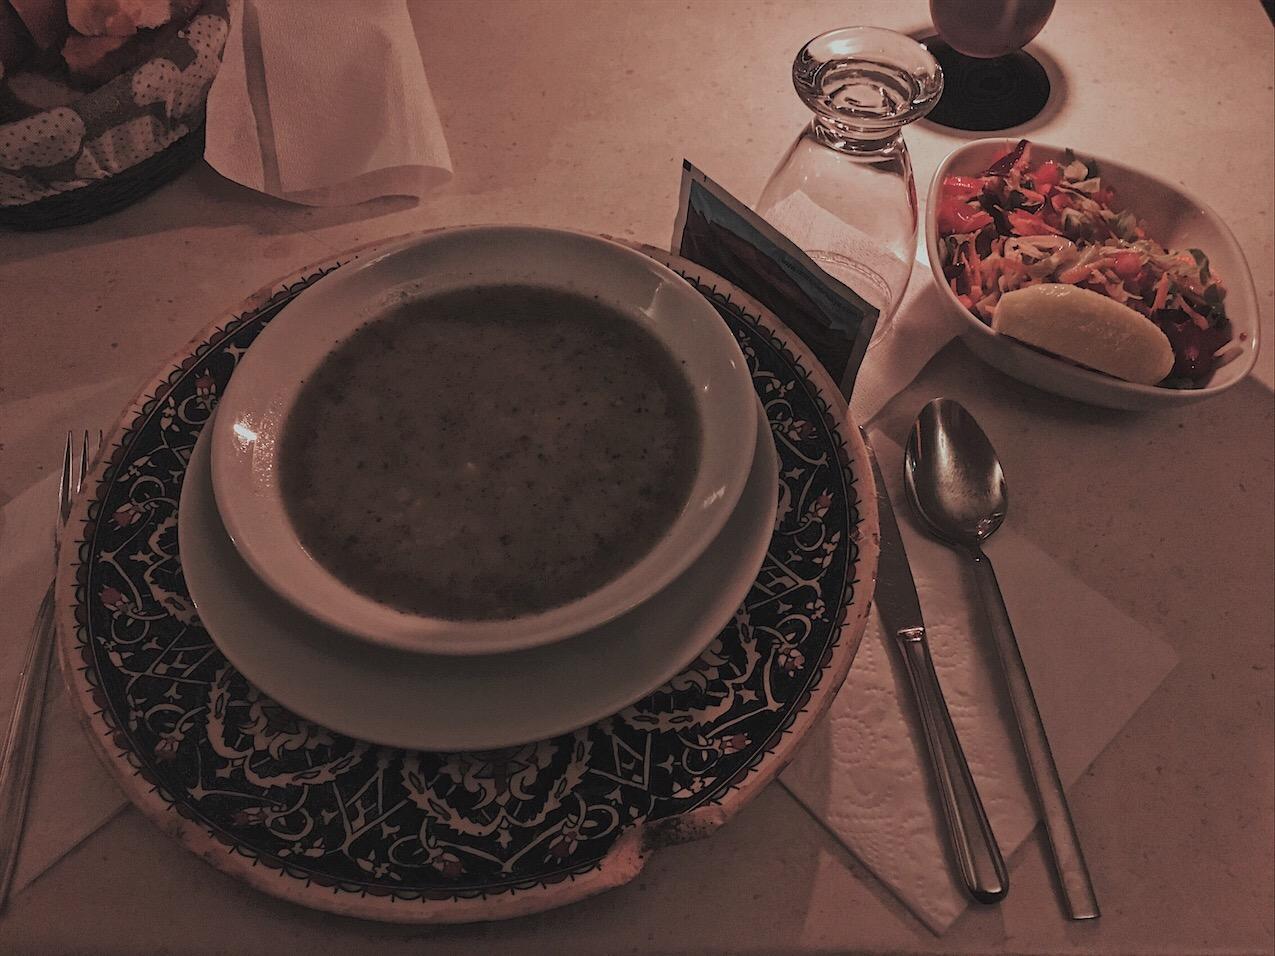 Uranos sarikaya restaurant Cappadocia turkey